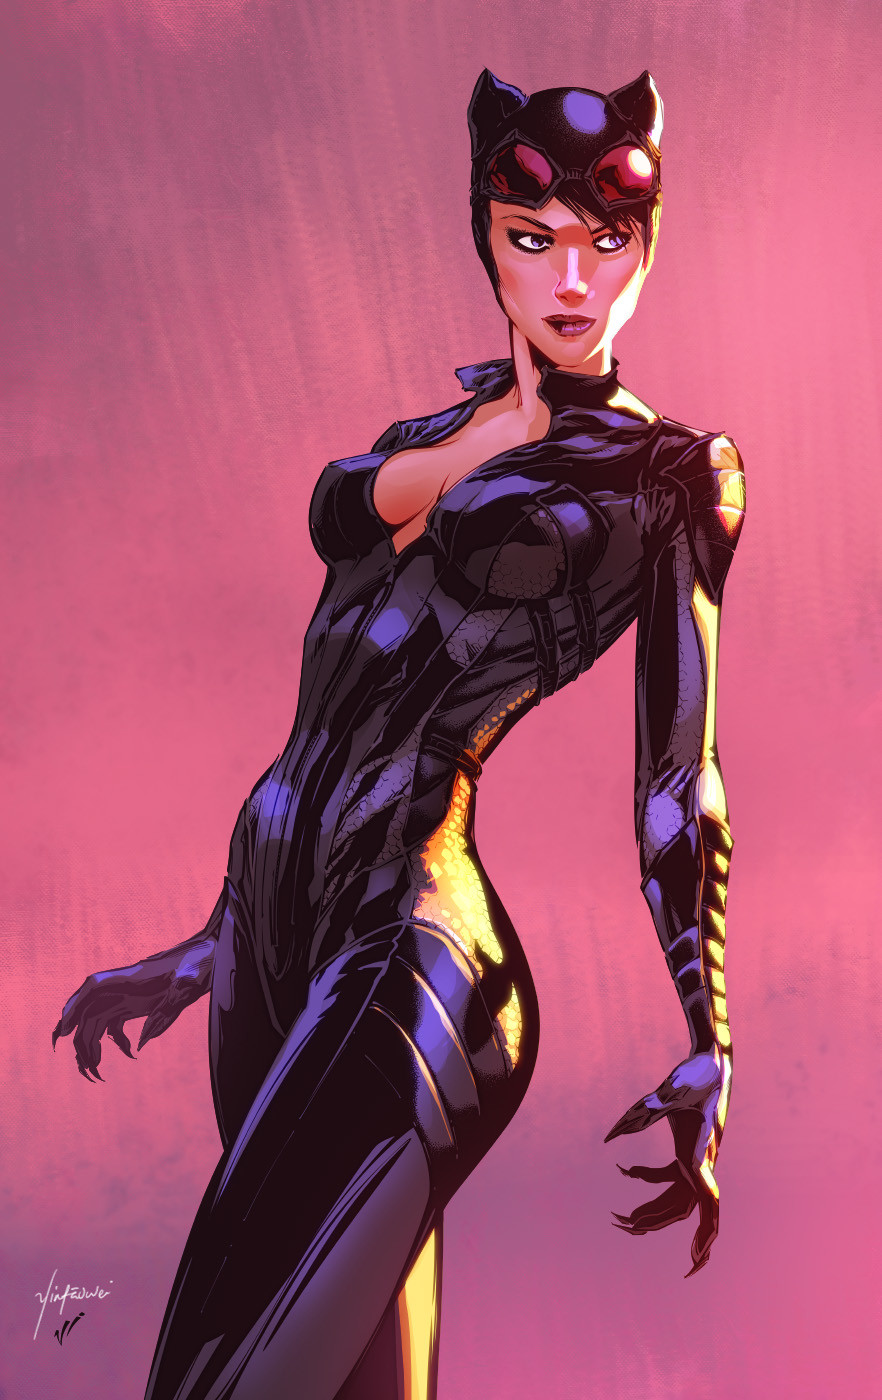 Harrison yinfaowei arkham knight catwoman by vitali iakovlev yinfaowei